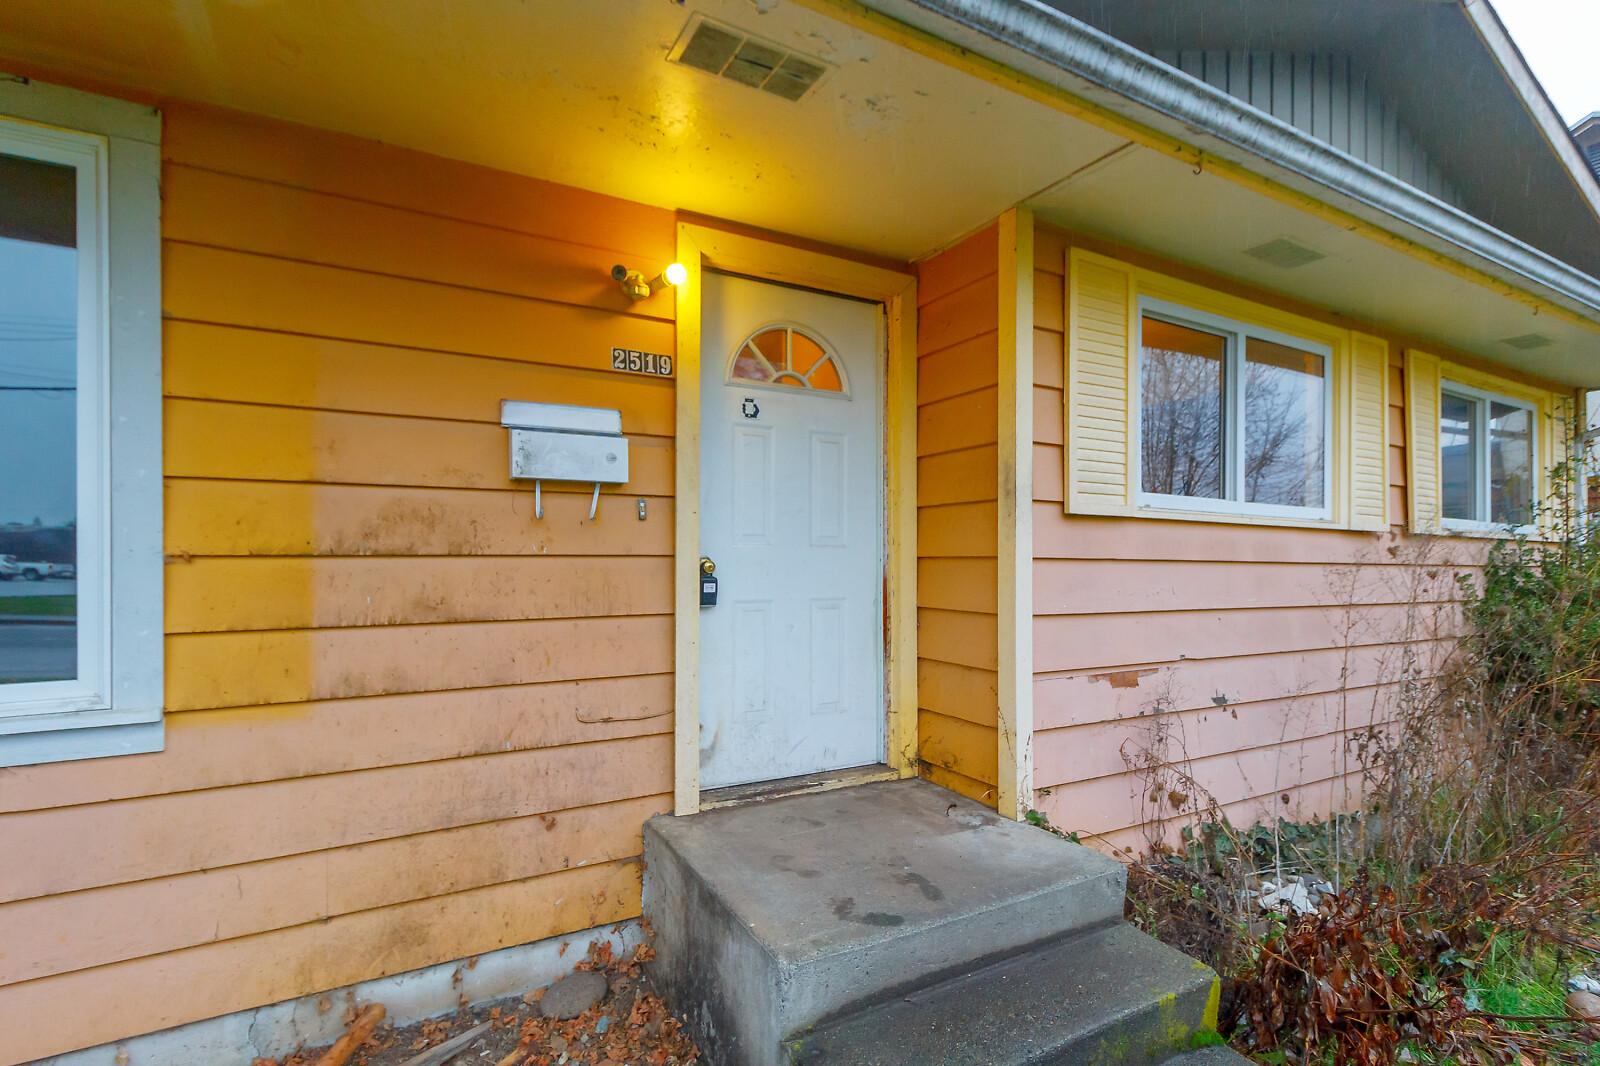 2519 Lewis St, Duncan, British Columbia  V9L 2Z2 - Photo 2 - 861929